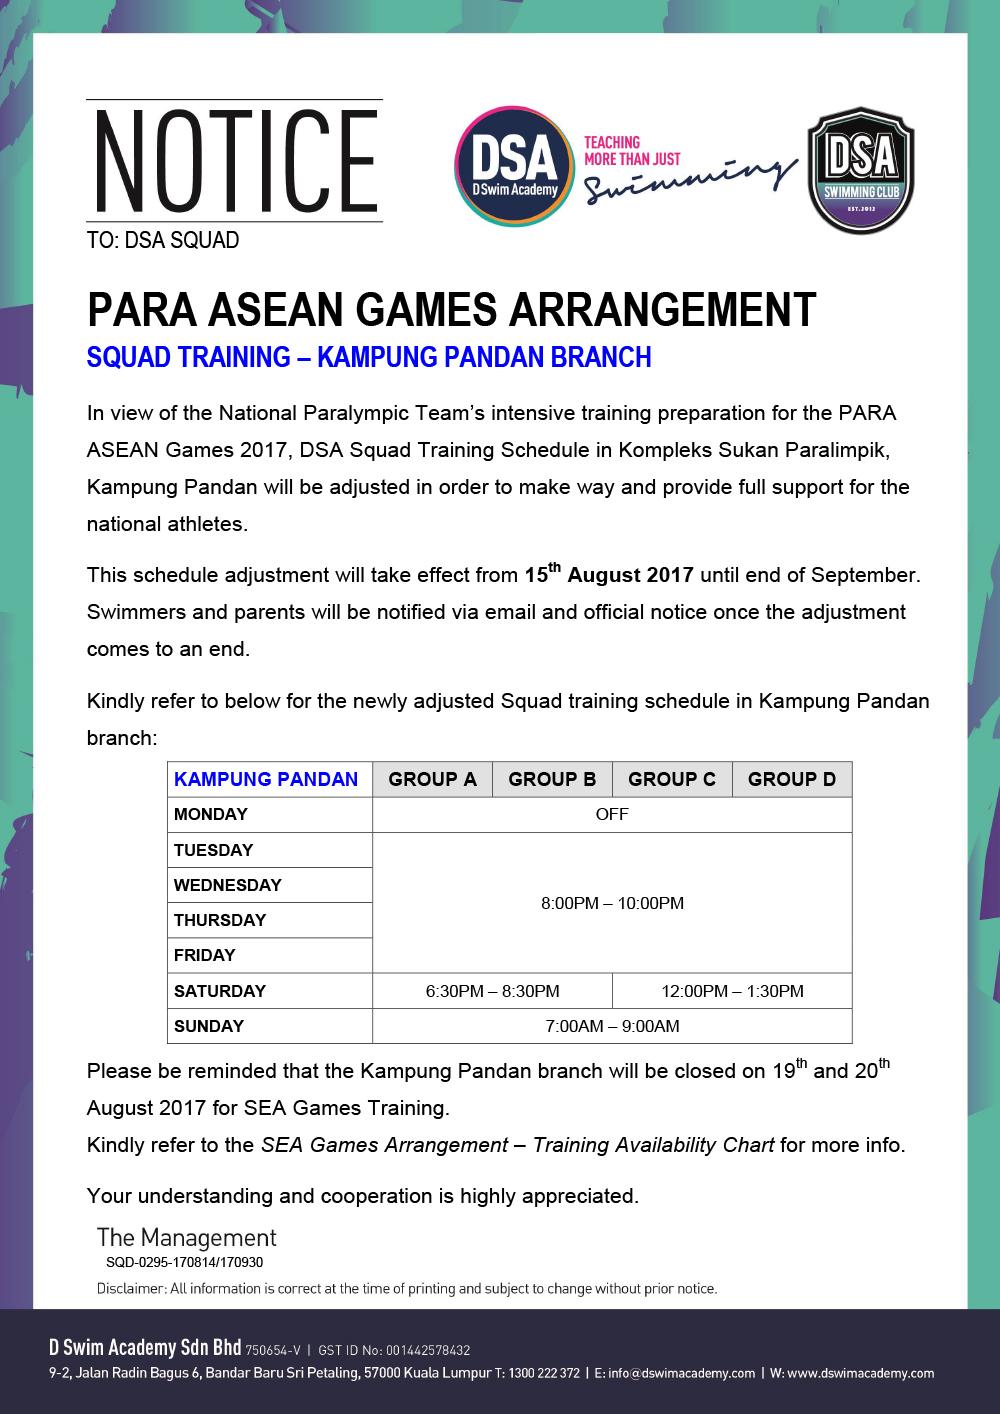 PARA-ASEAN Games Arrangement